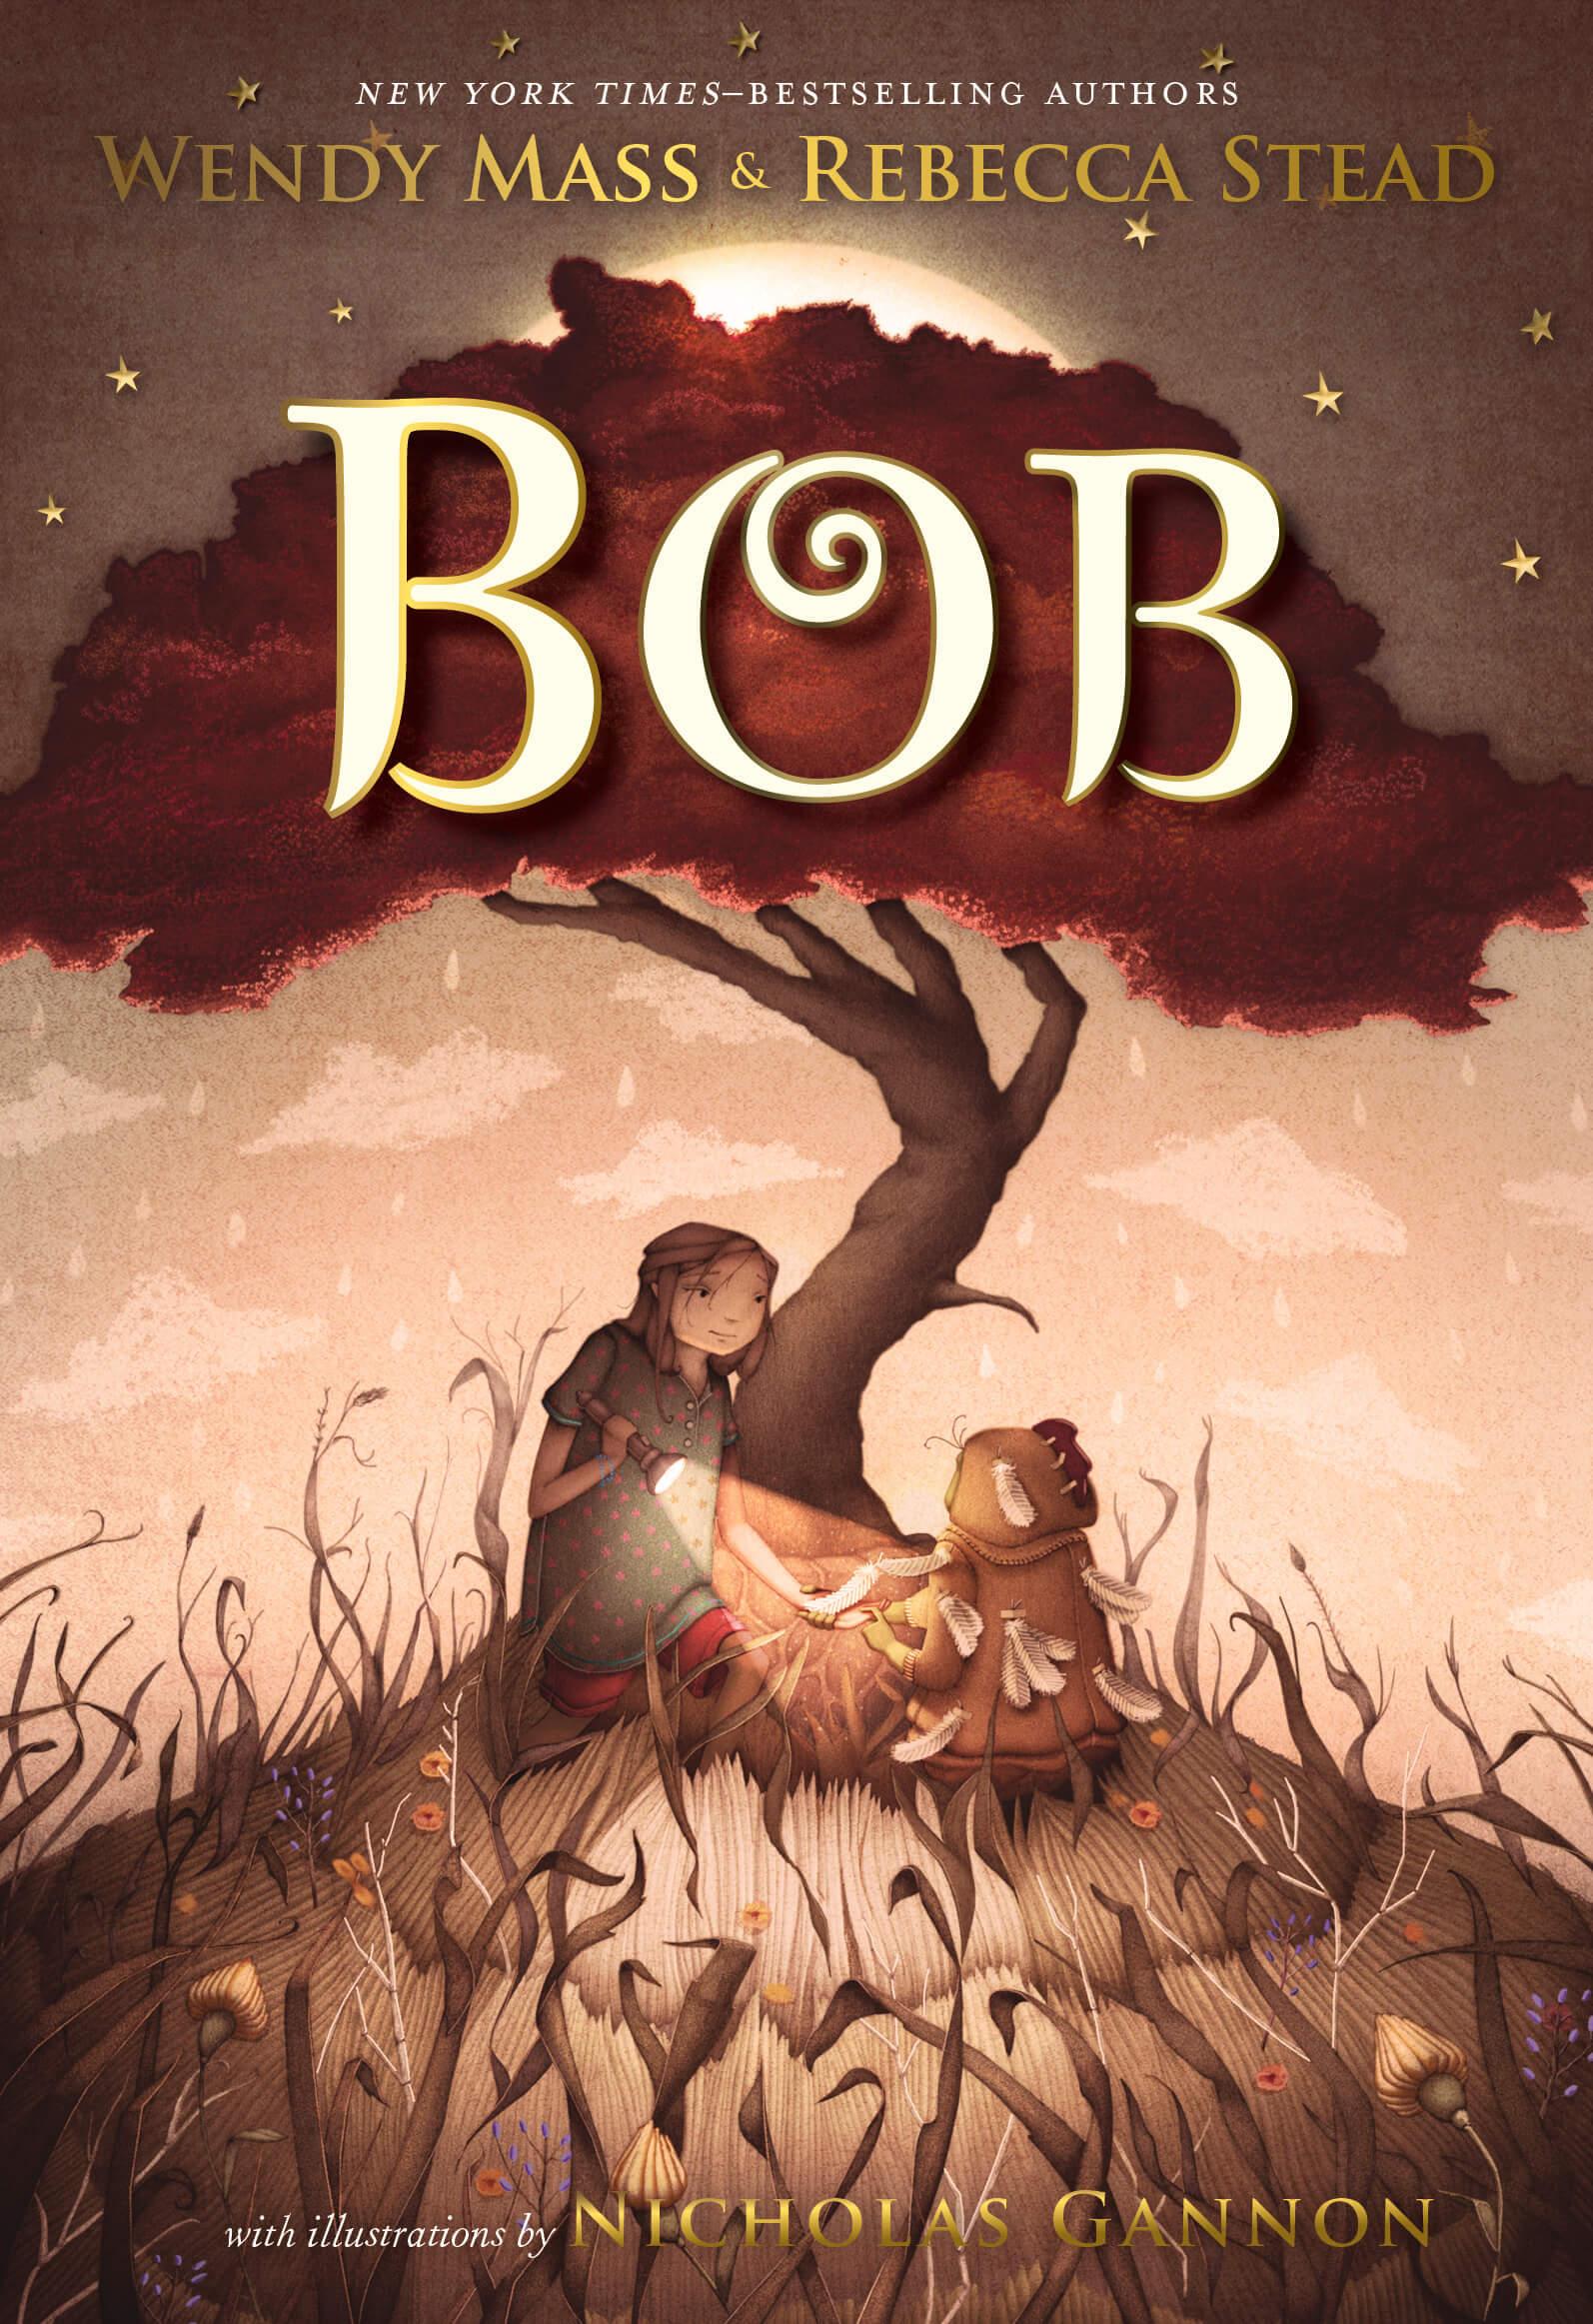 bob book symphony space